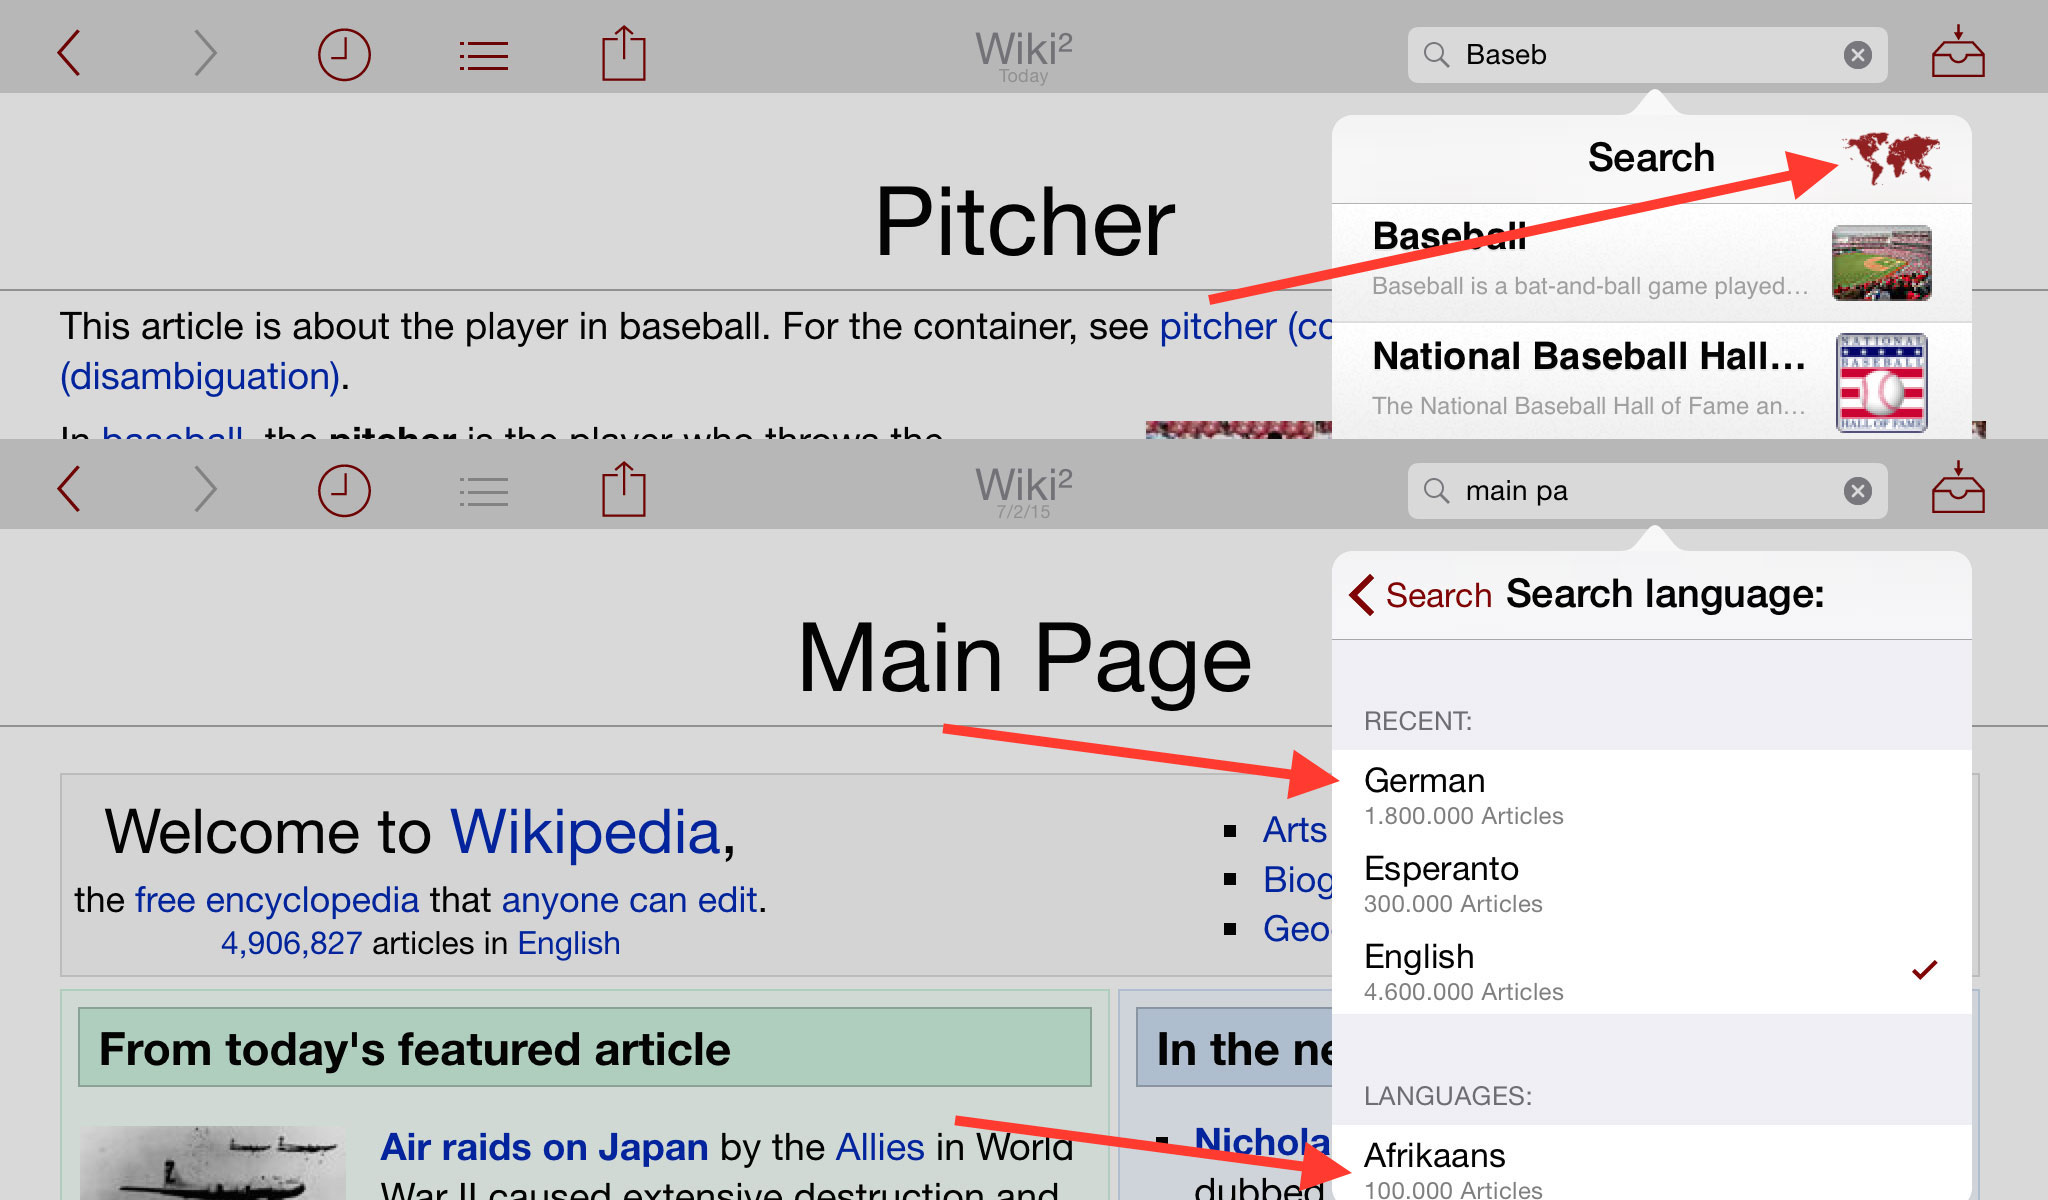 Select the Wikipedia search language